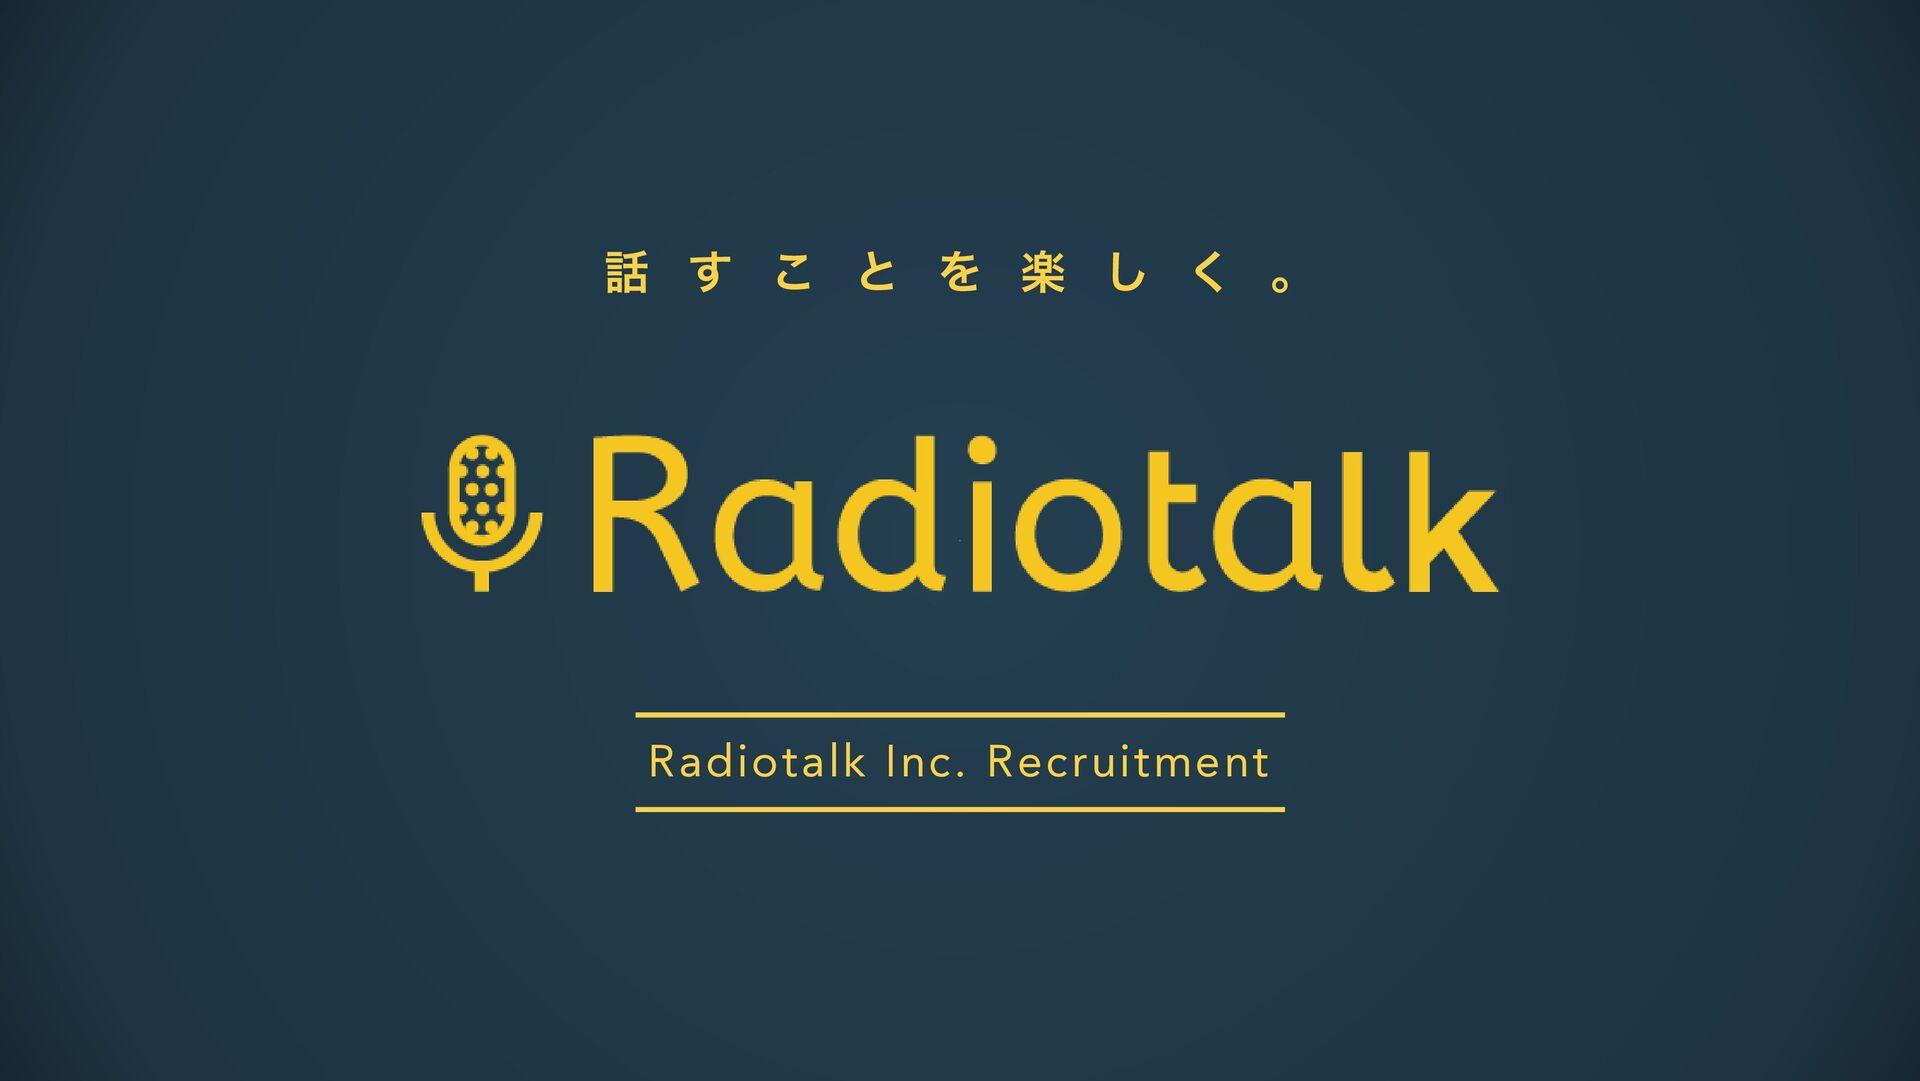 Radiotalk Inc. Recruitment. ԻͷΤϯλʔςΠϝϯτͰ/P...